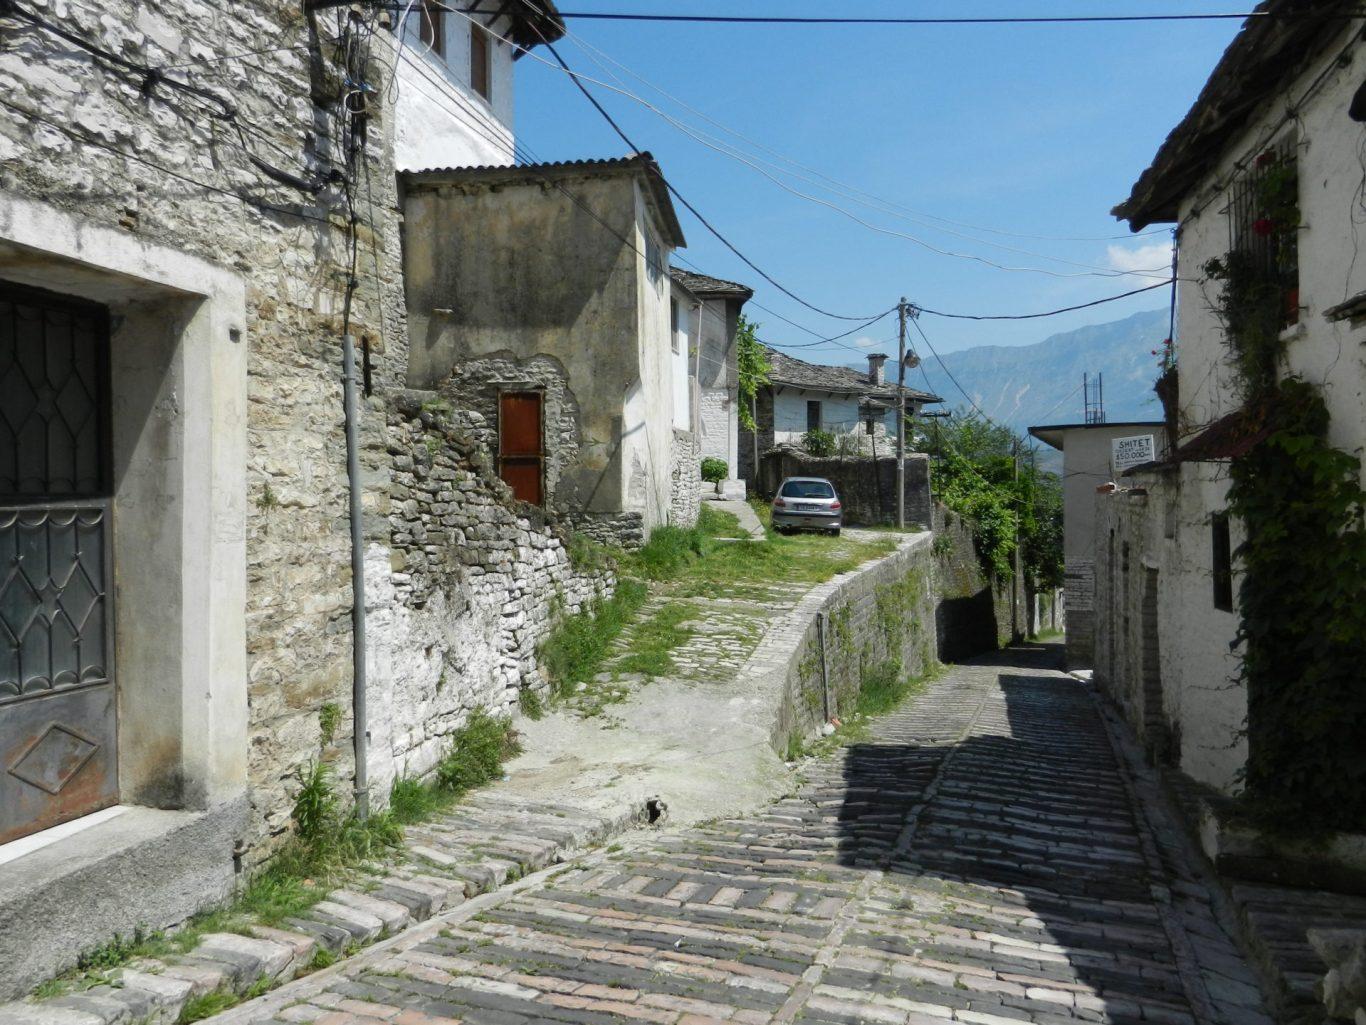 Streets of Saranda, Albania